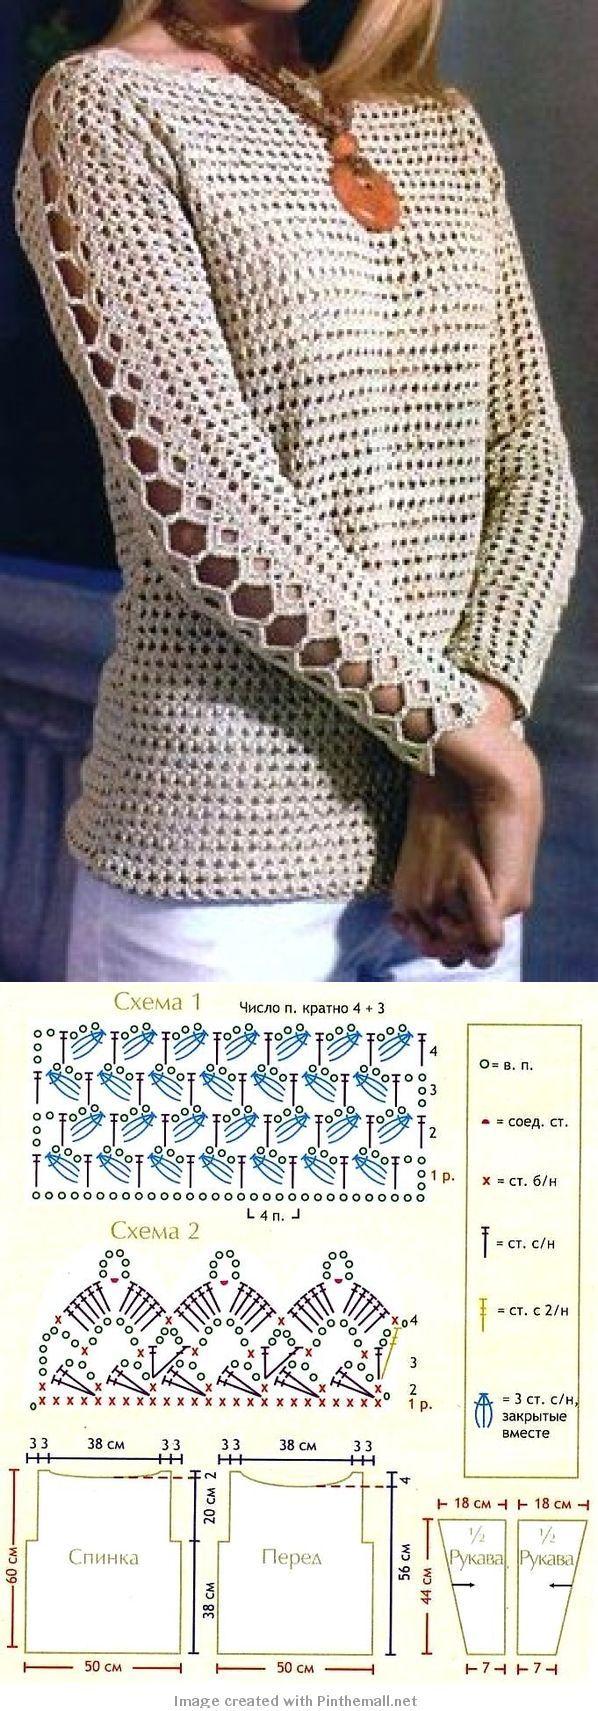 Crochet Top - Free Crochet Diagram - (stylowi) | crochet clothes ...